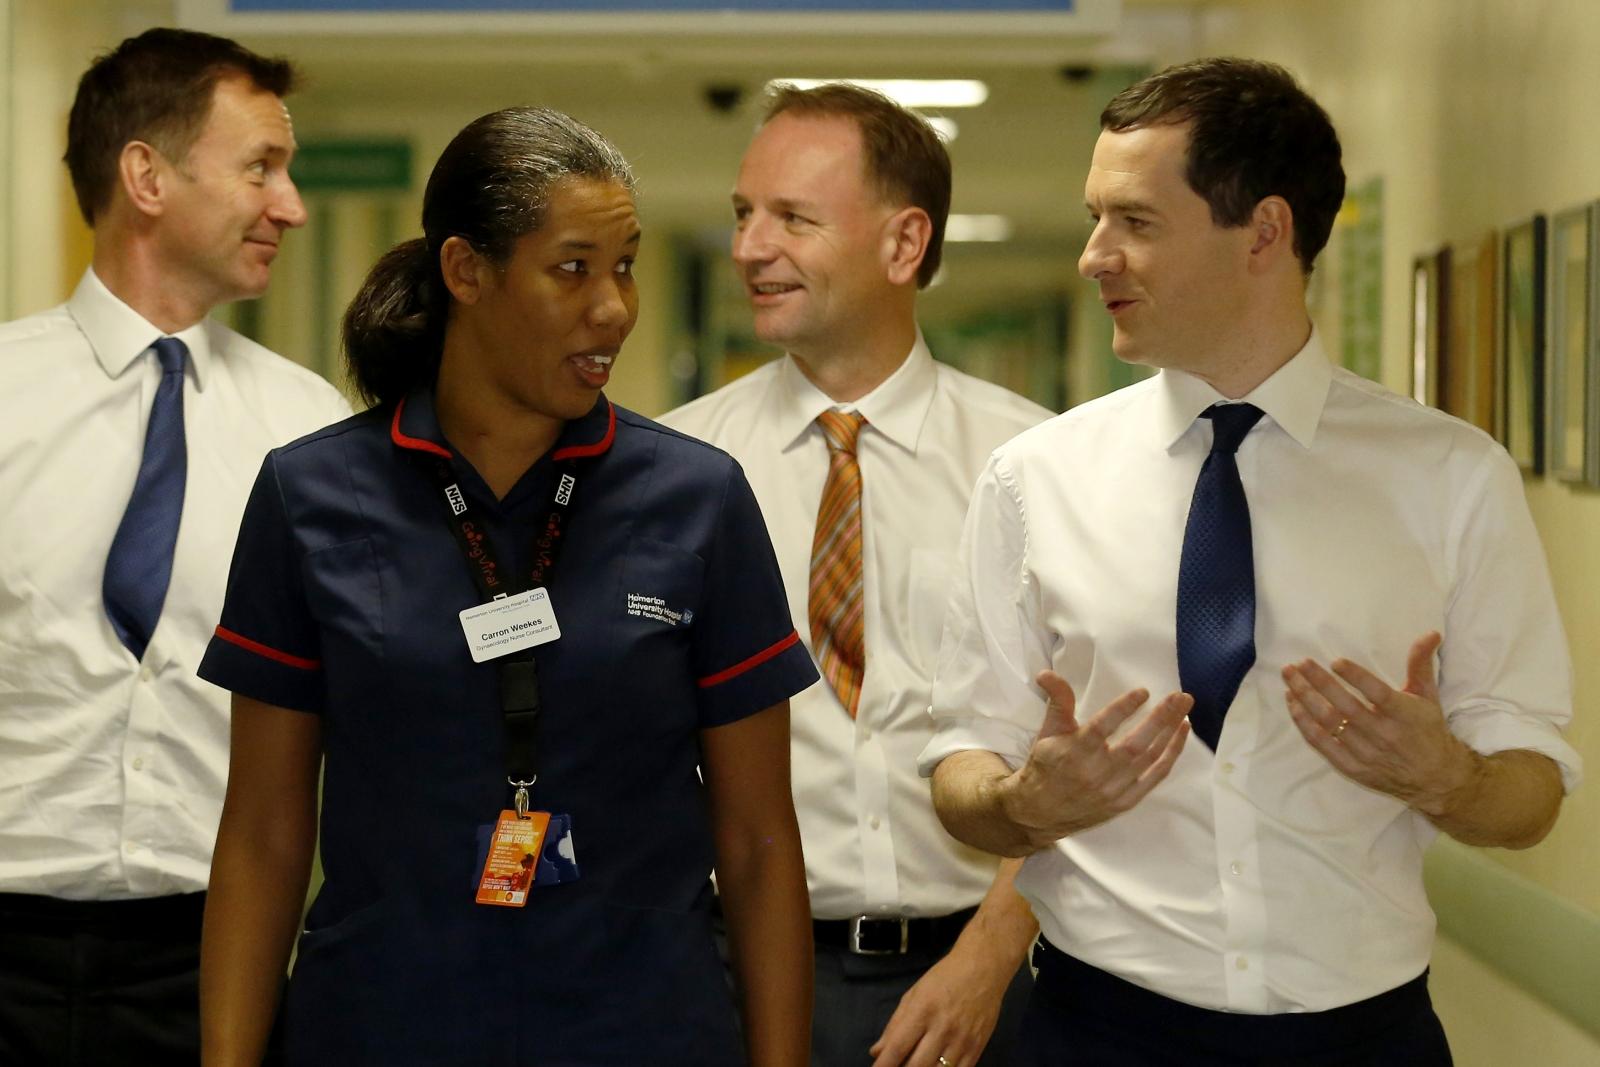 Tories in £8bn NHS pledge